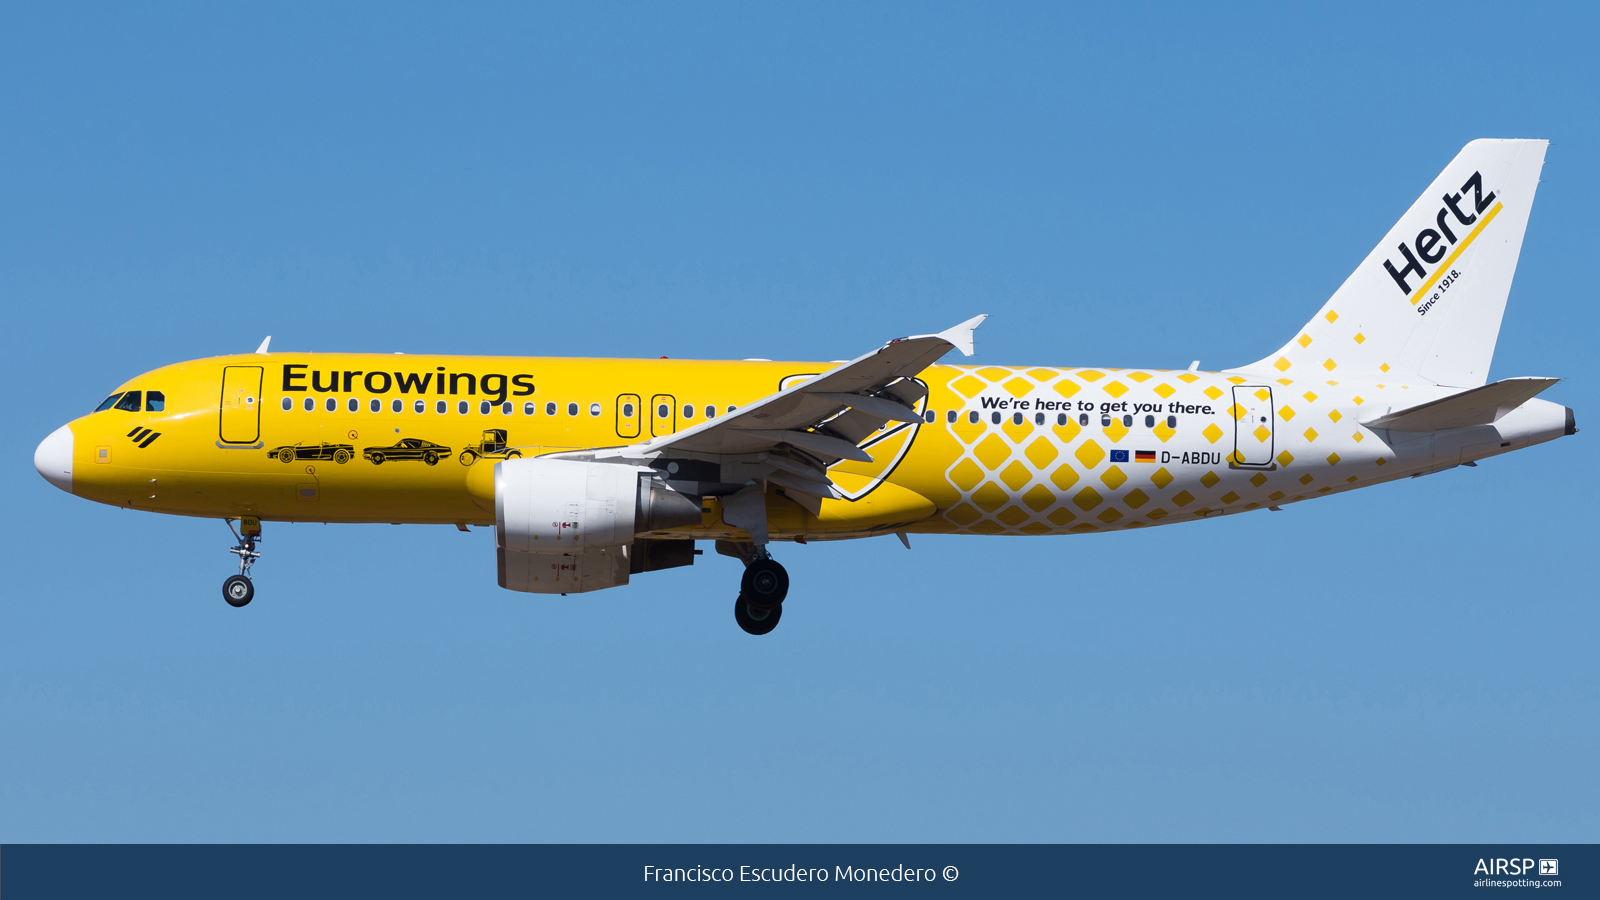 Eurowings  Airbus A320  D-ABDU